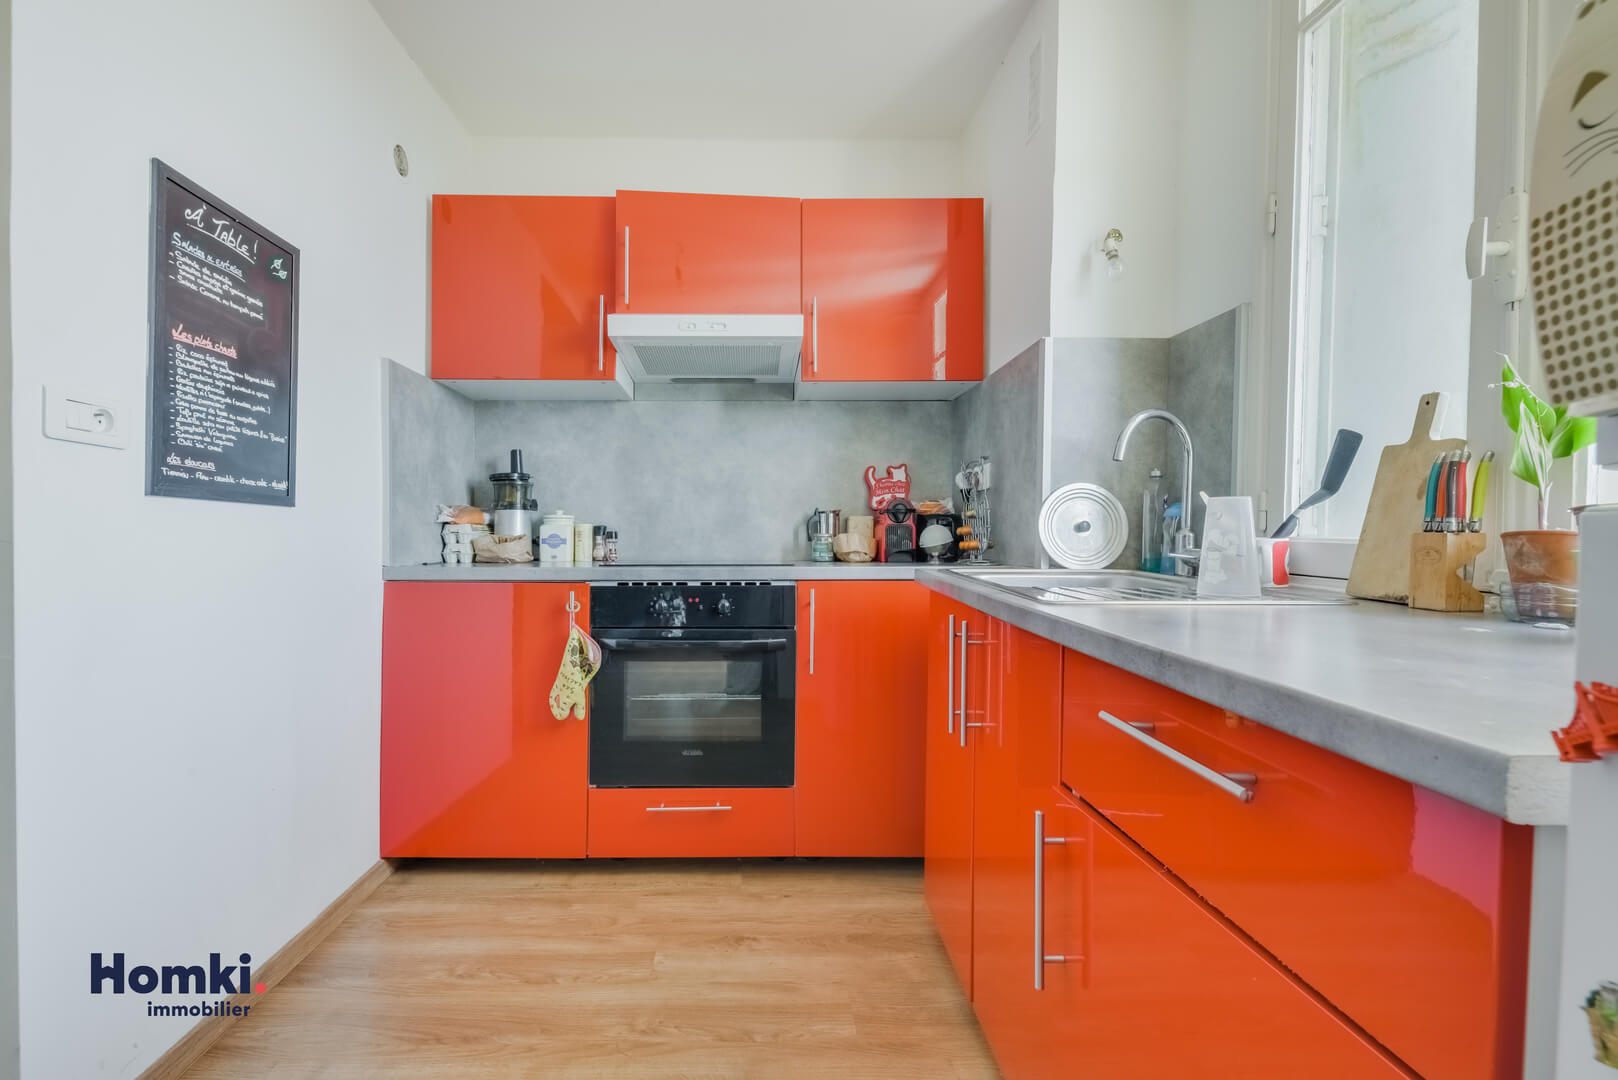 Vente appartement Marseille T3 13006 Castellane Prado_5